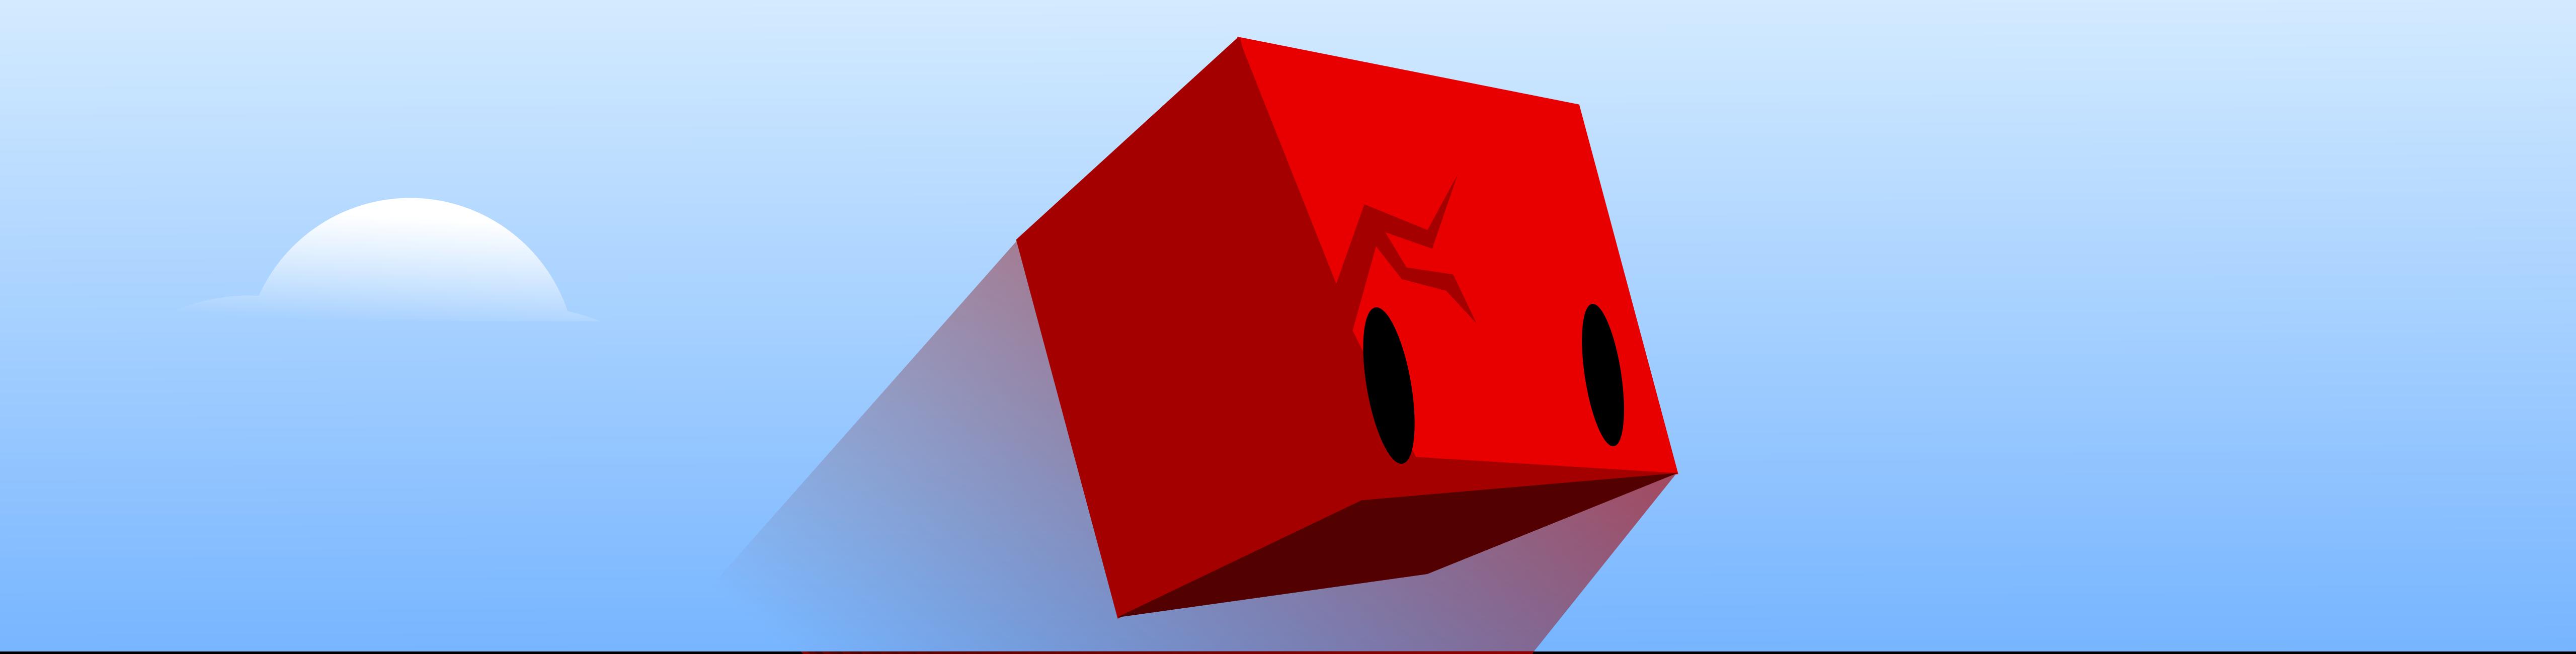 Cube-30-S